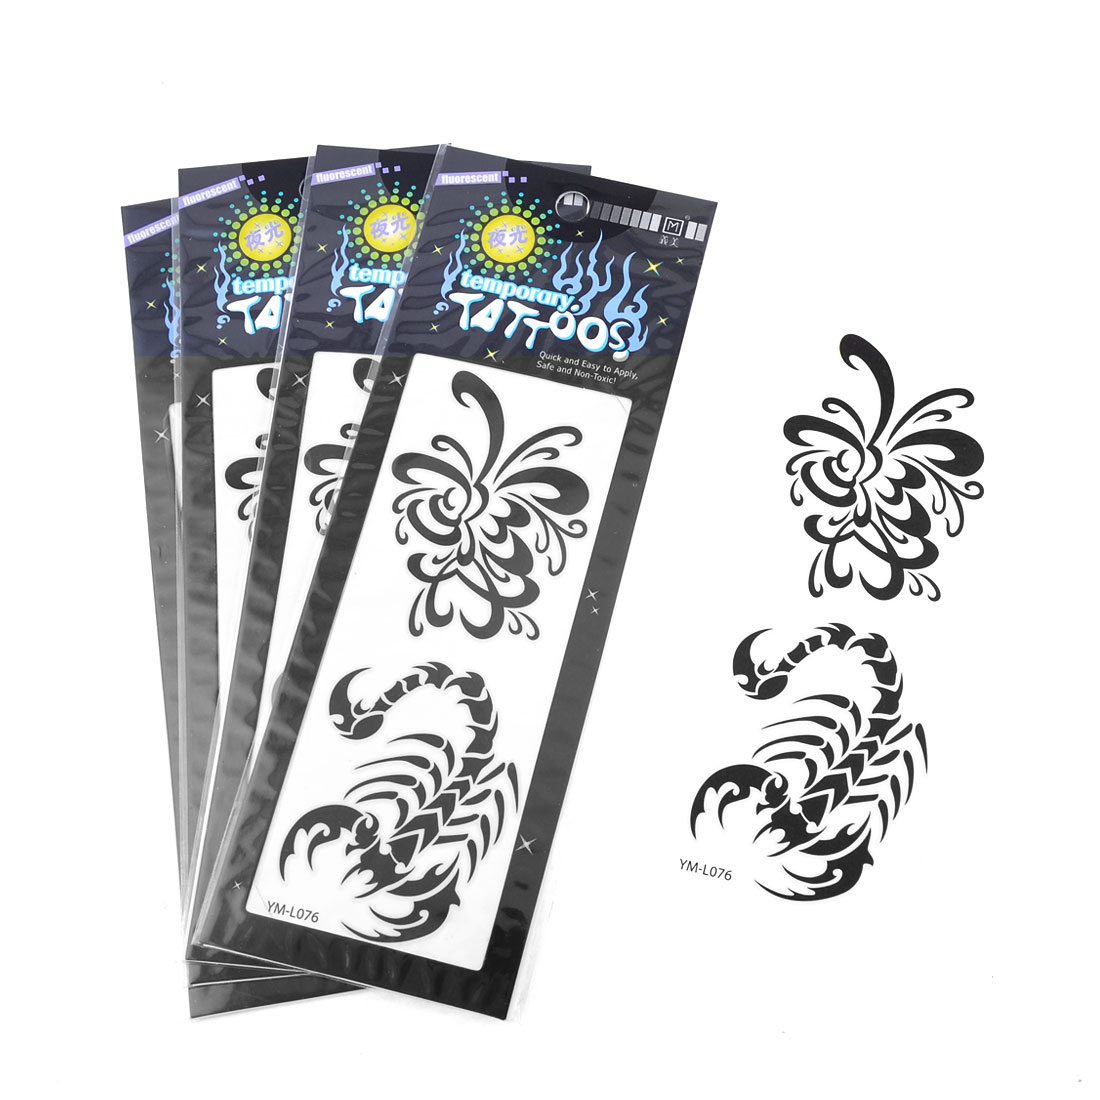 Black Scorpion Flower Printed Transfer Luminous Tattoos Sticker Beauty Tool 5Pcs